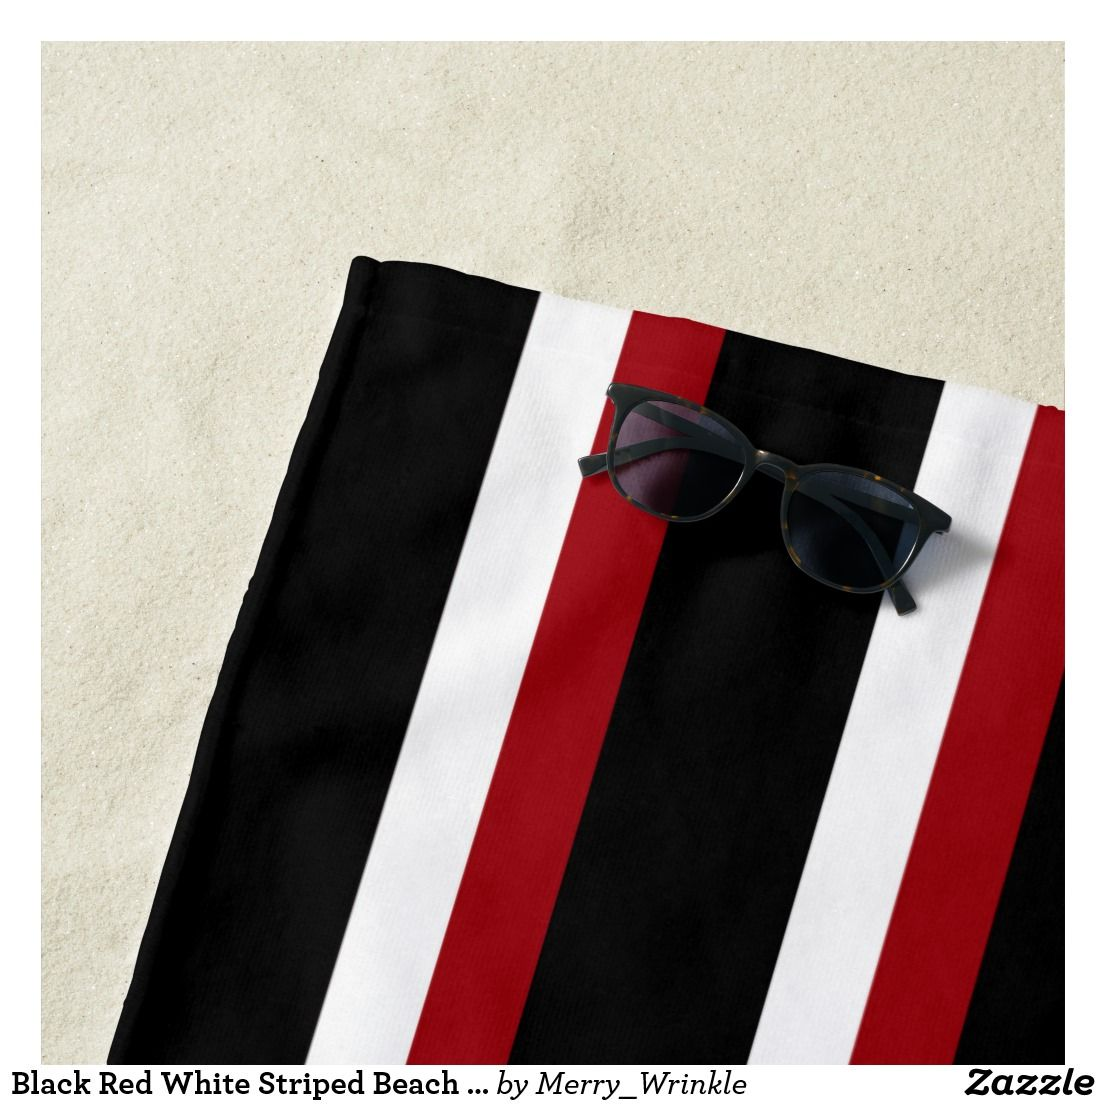 Black Red White Striped Beach Towel Zazzle Com Striped Beach